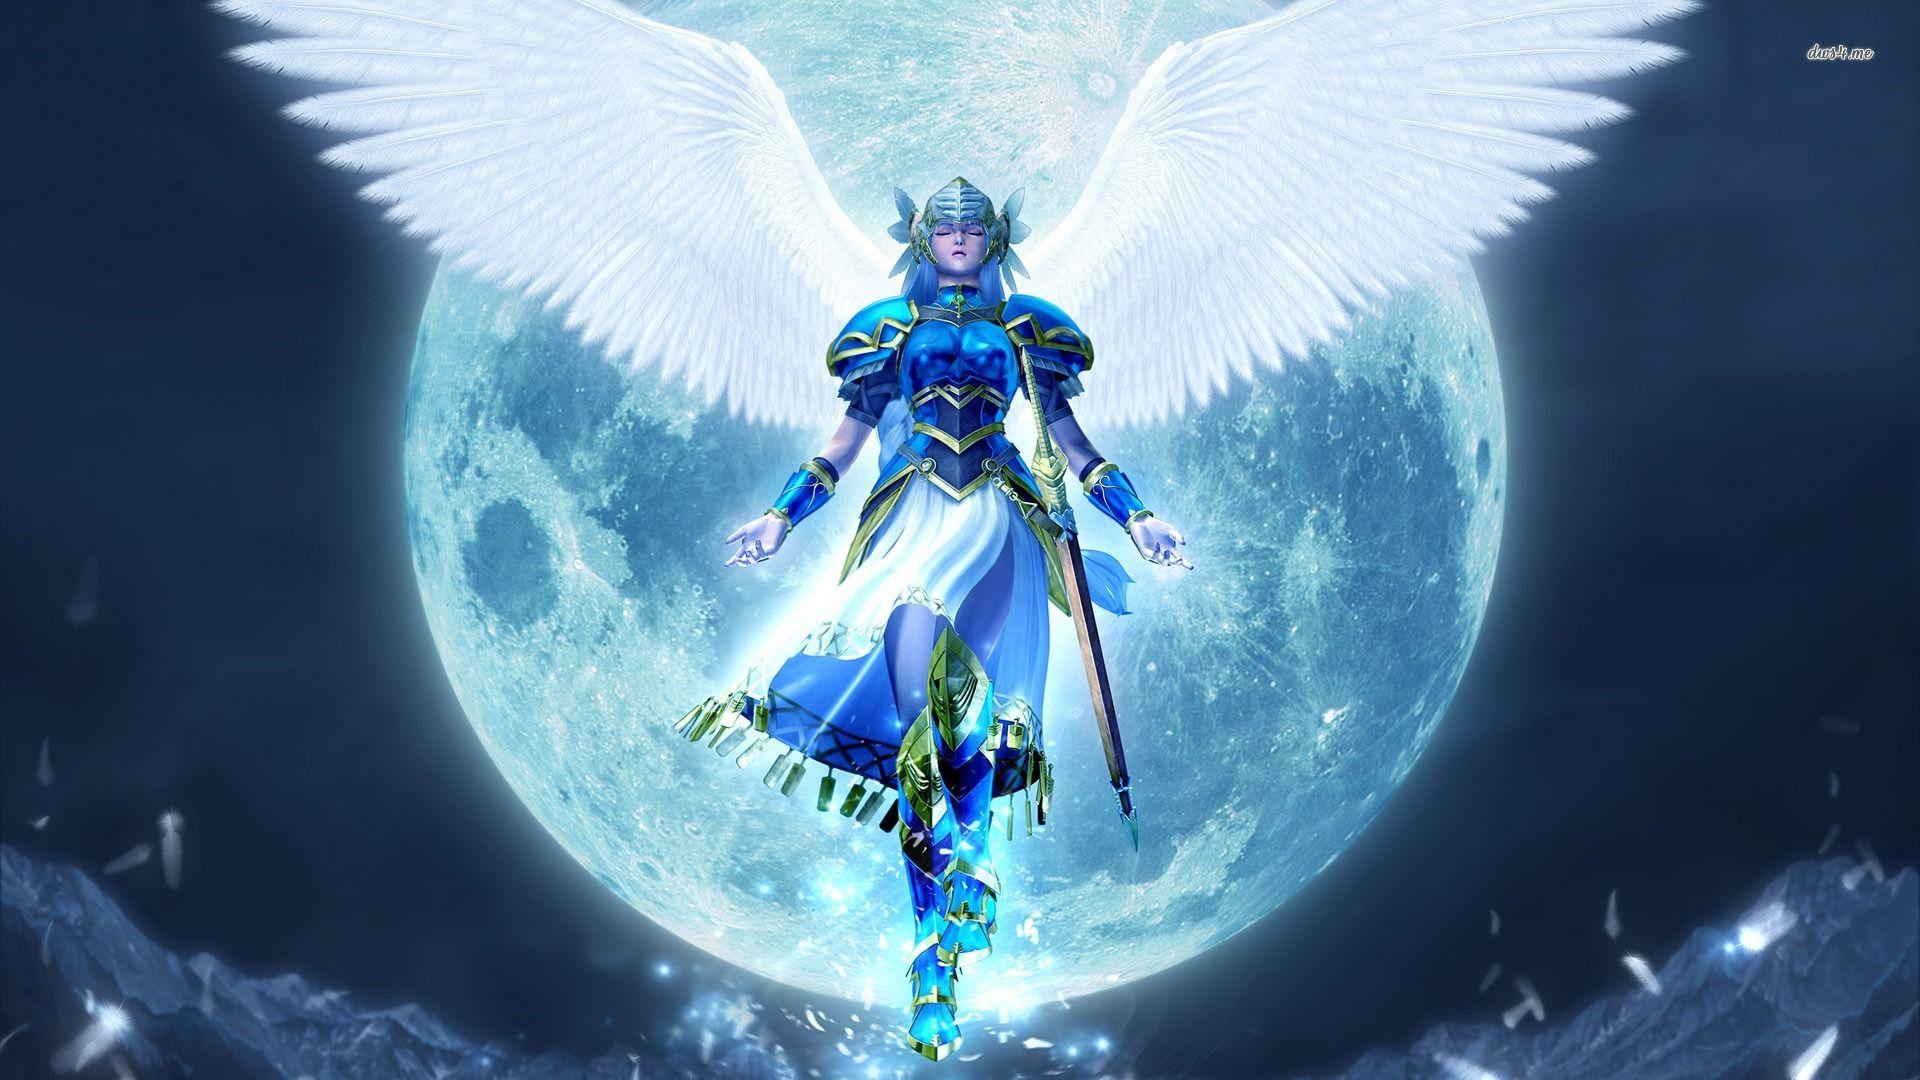 silikontitten angel of fantasy